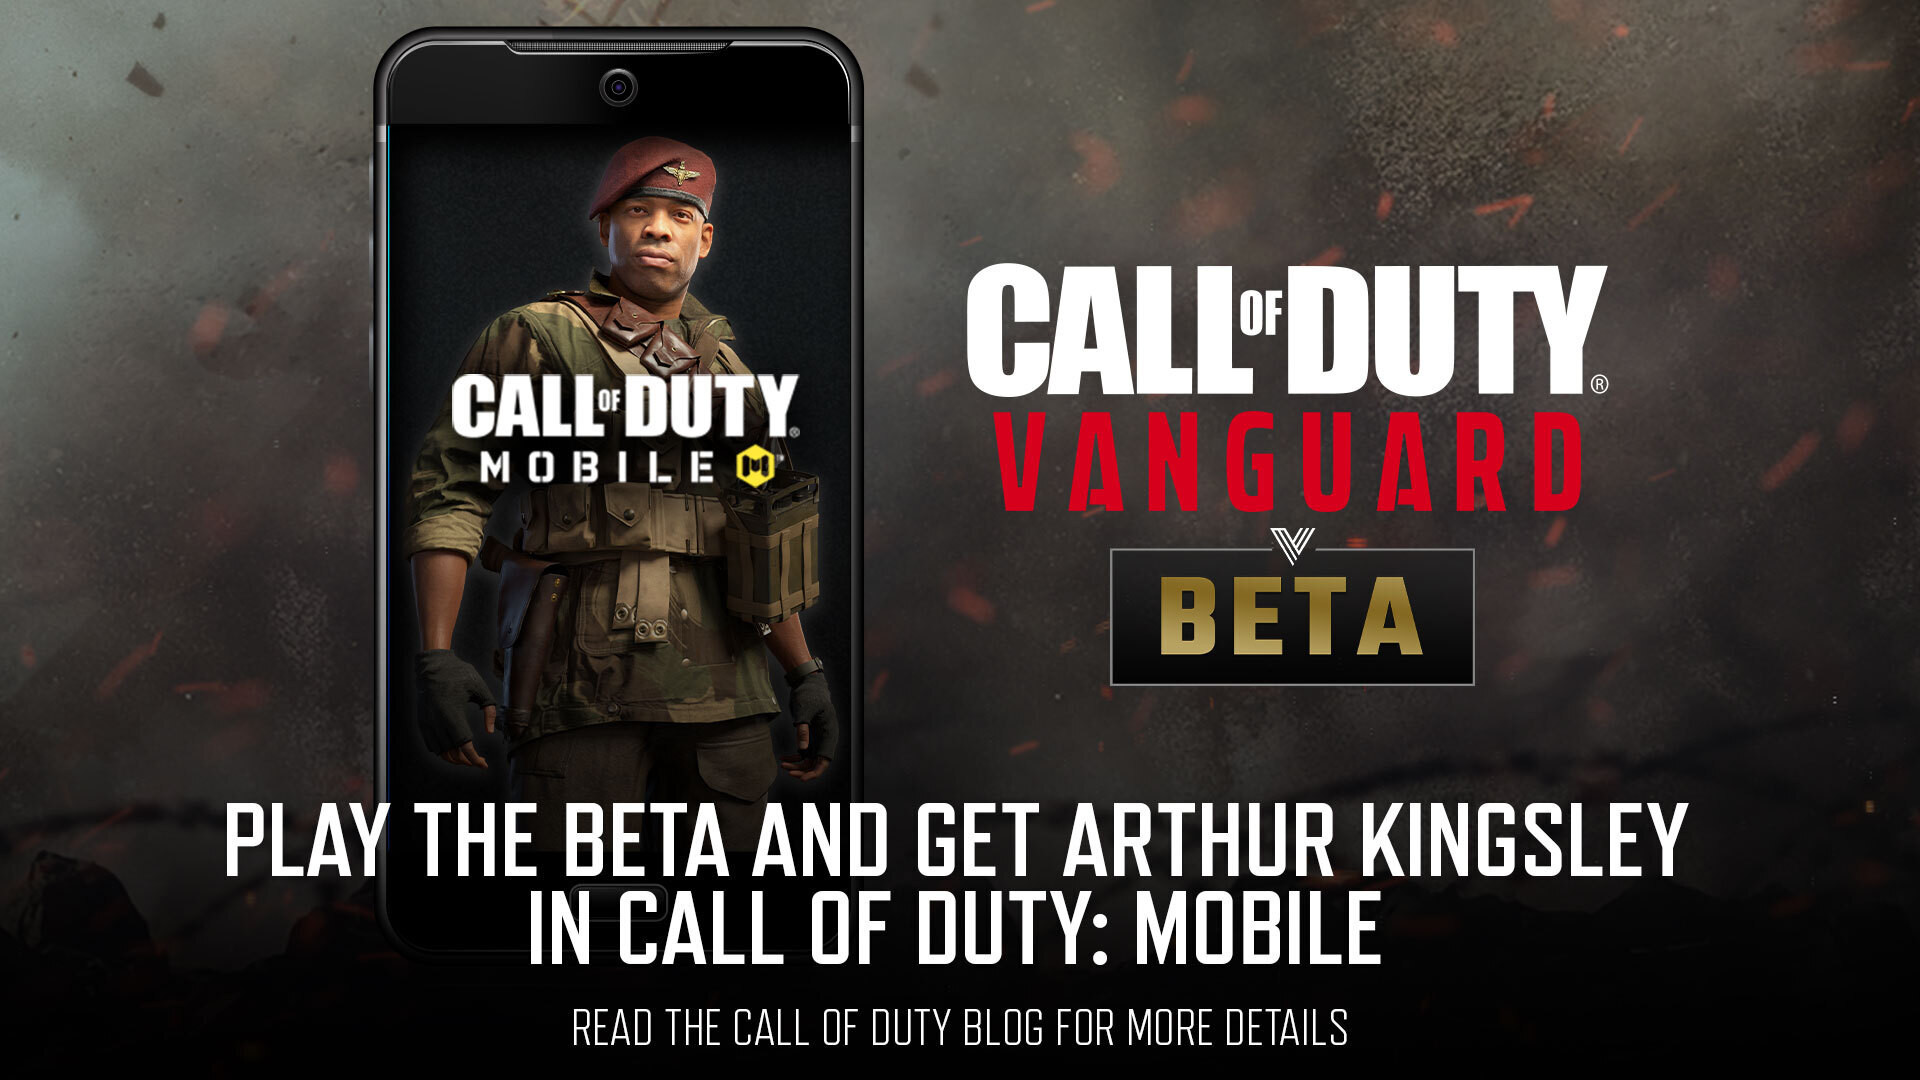 Play the vanguard beta